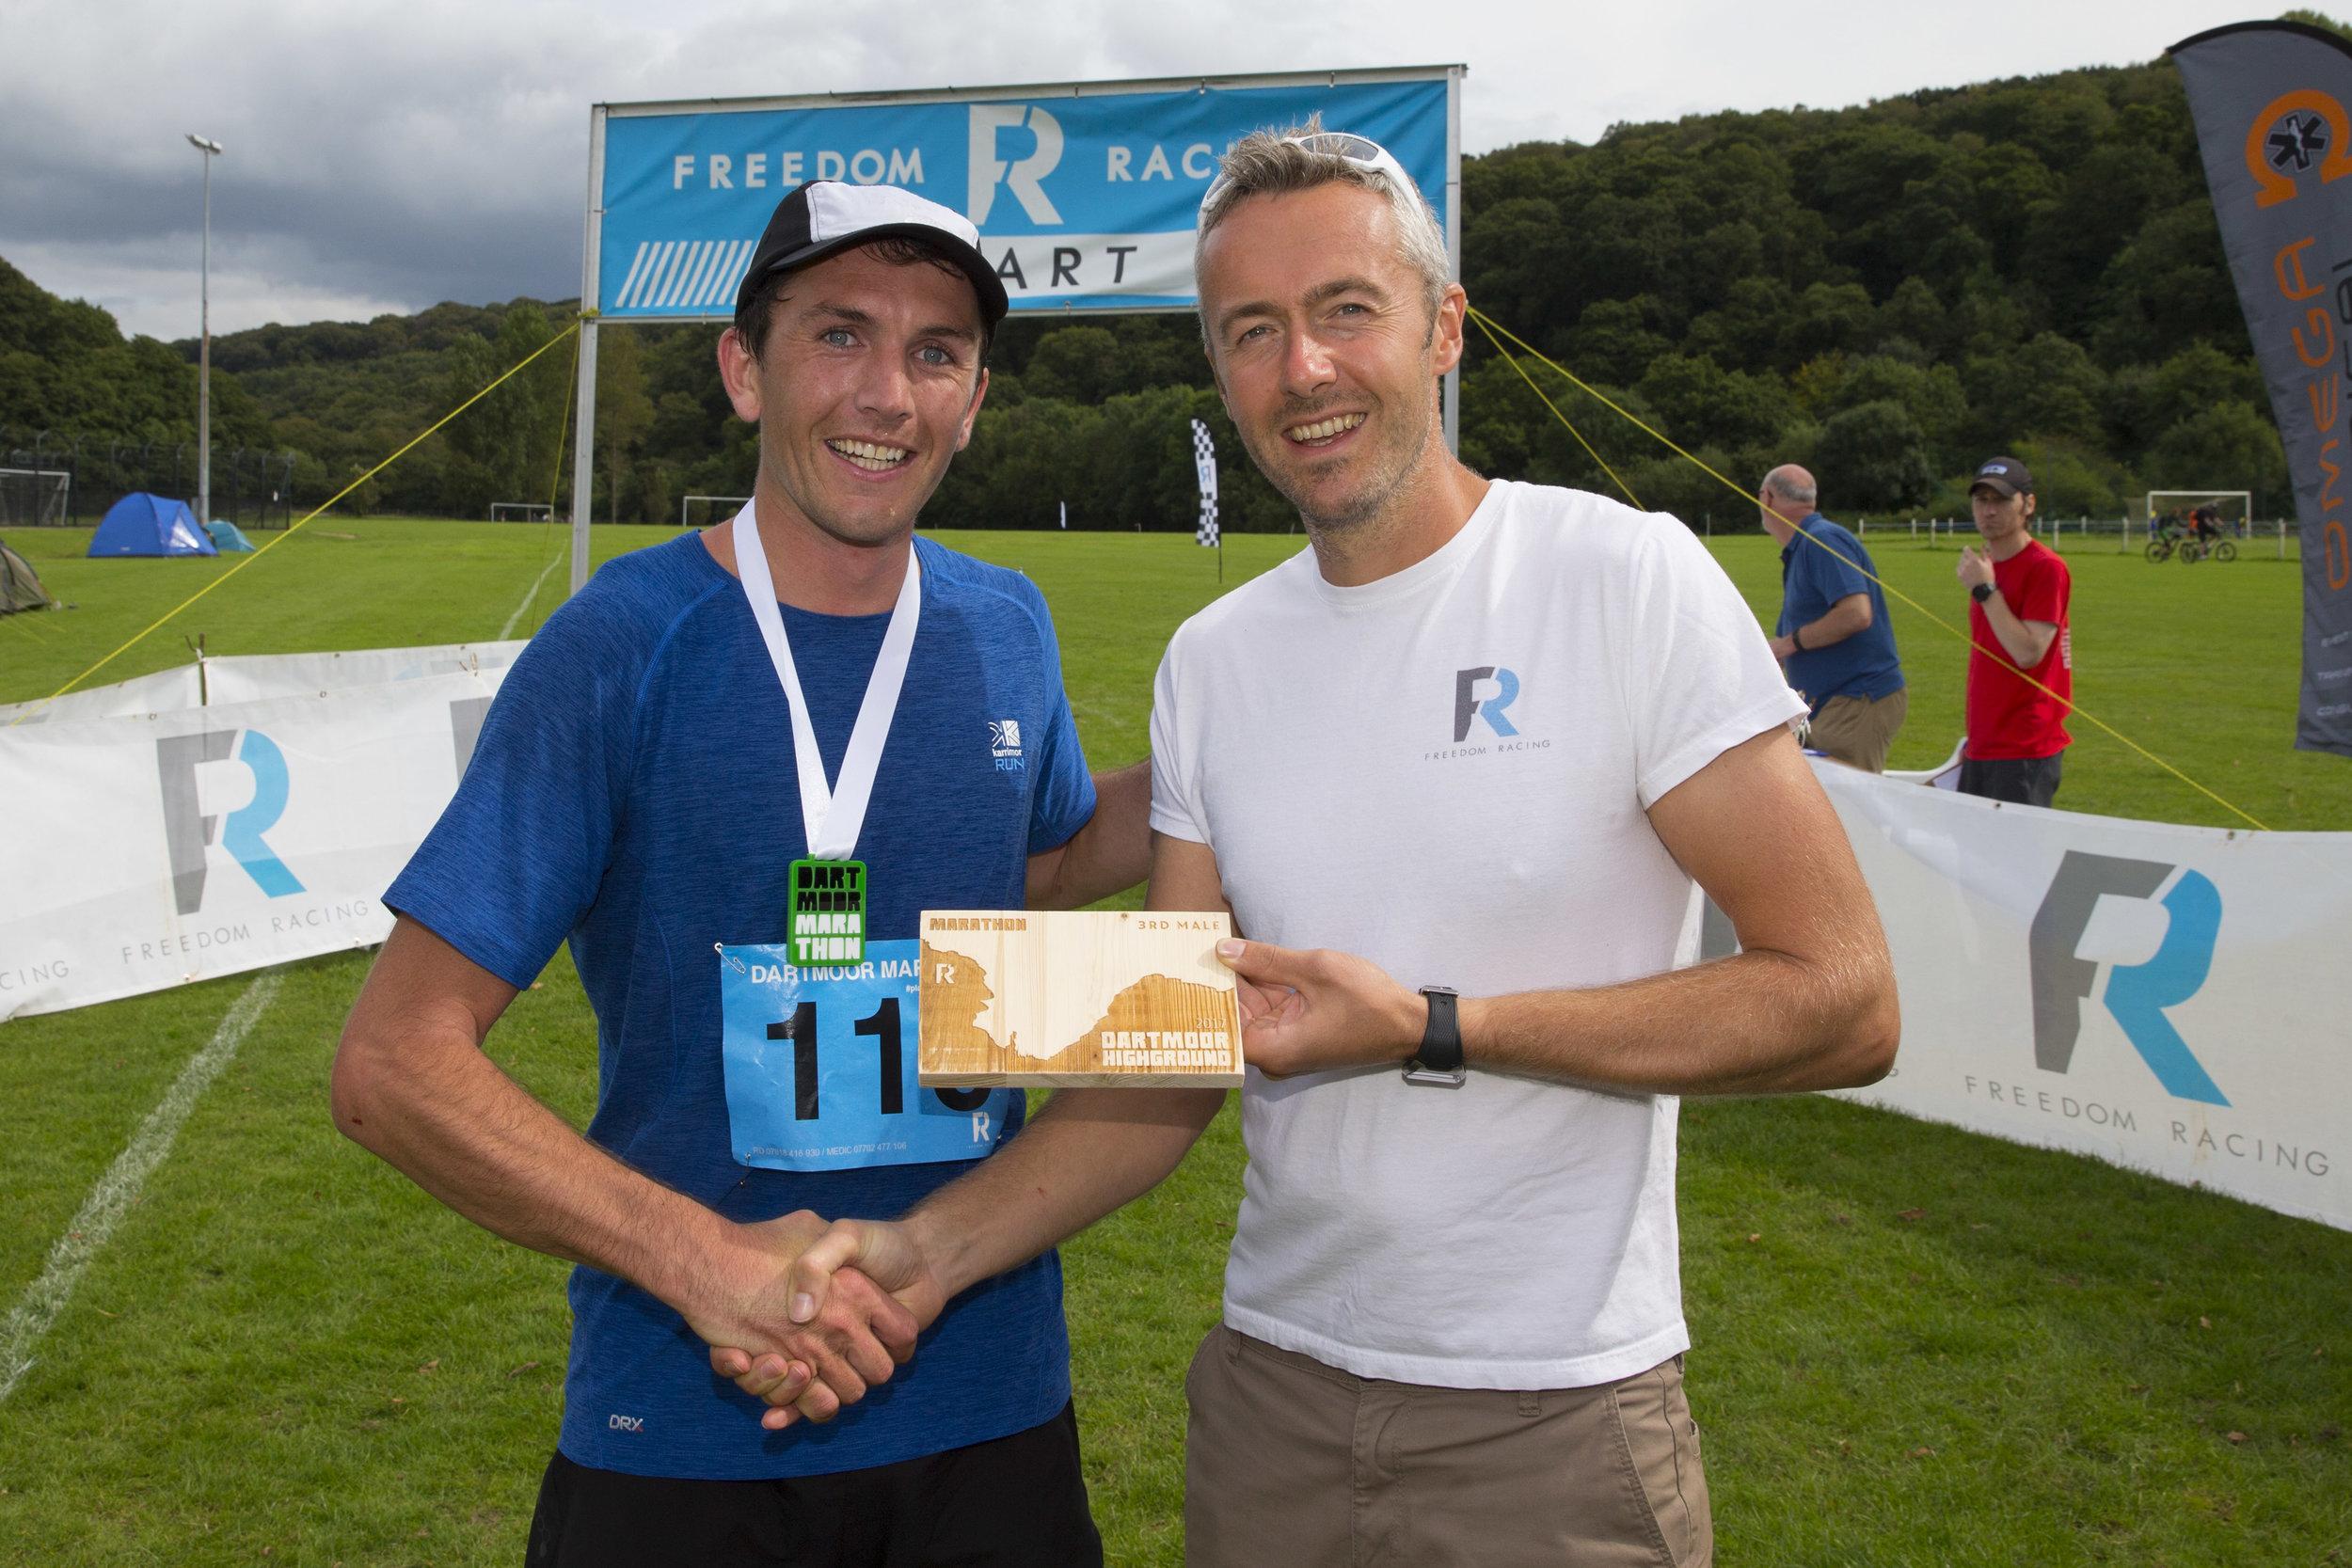 2017 Dartmoor Marathon 2nd place